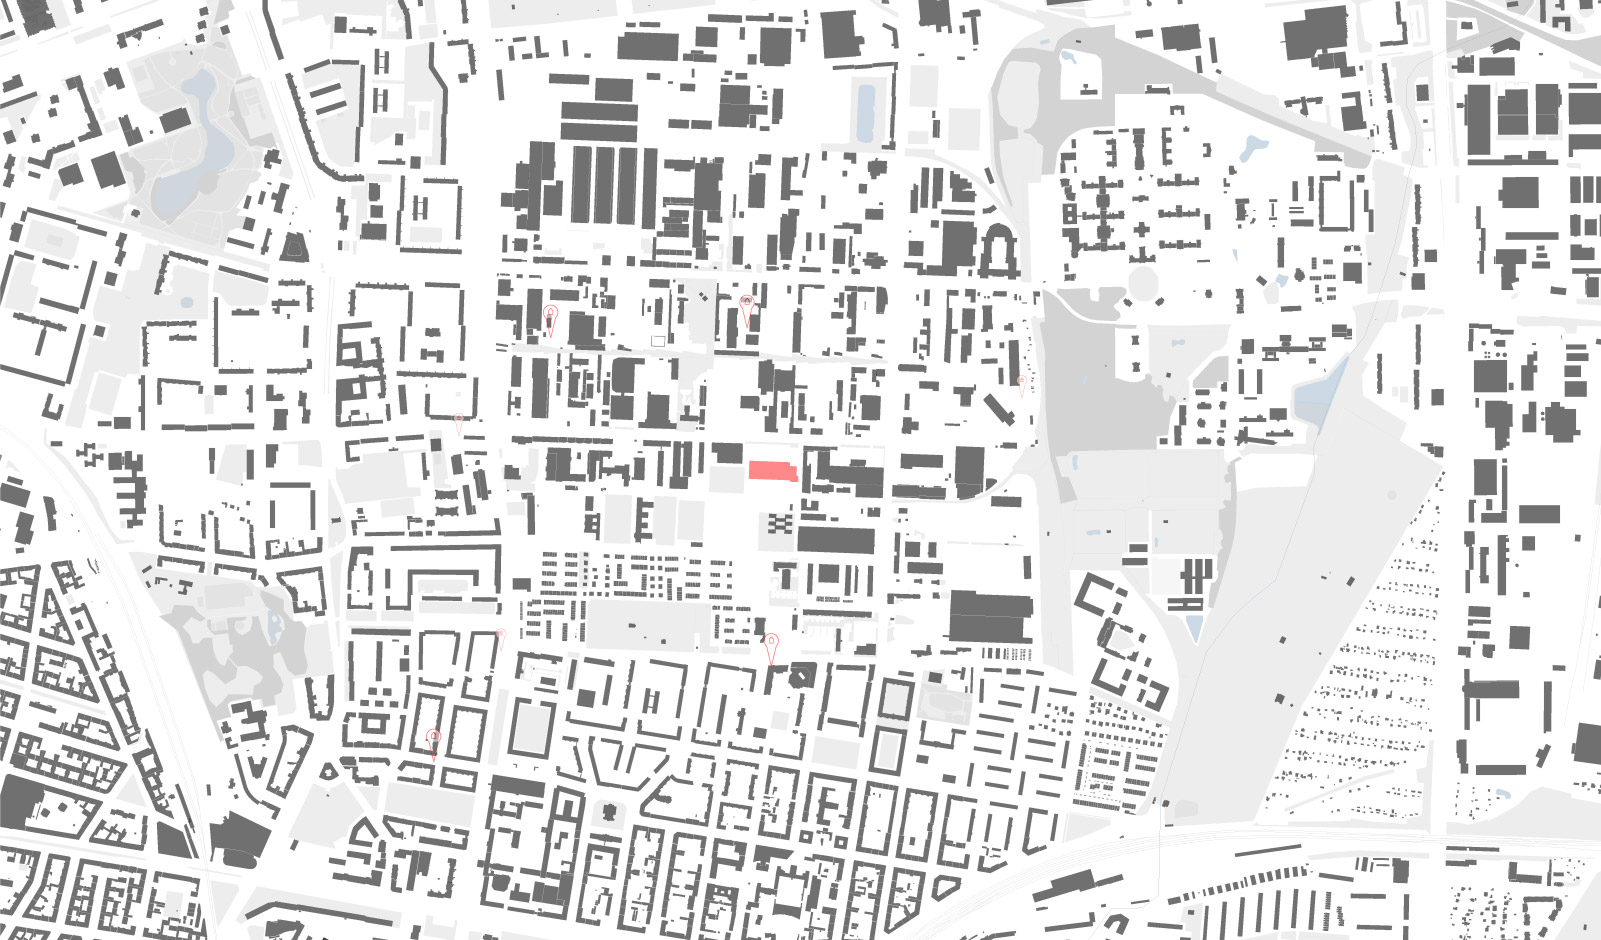 DHL_MechZB_siteplan